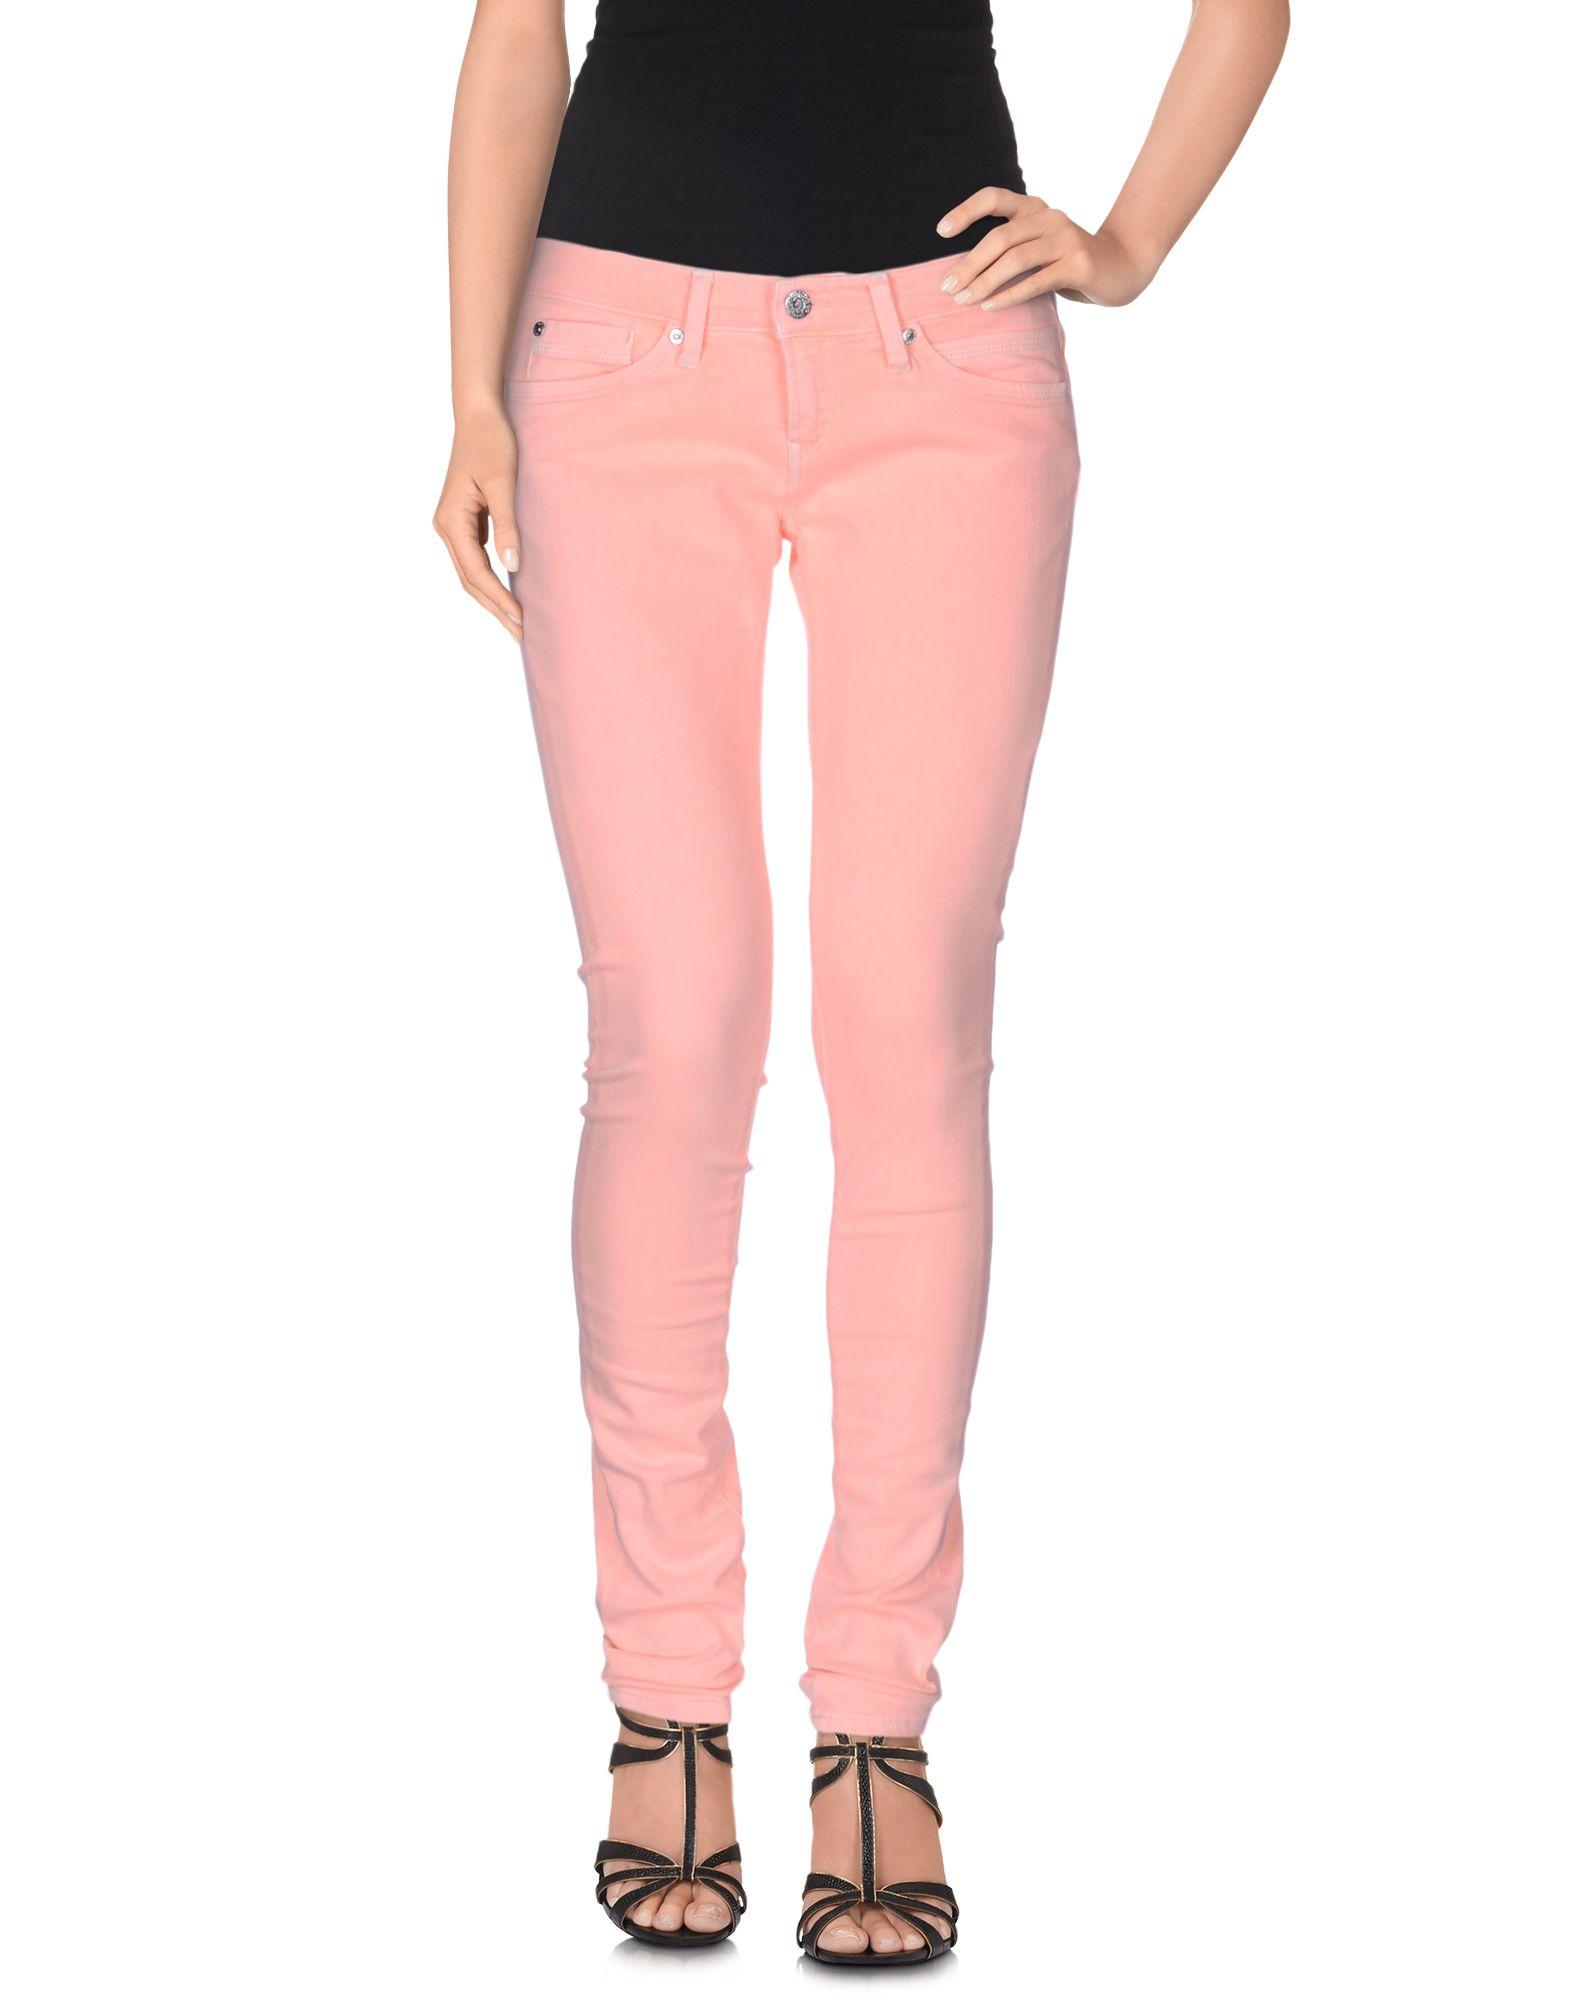 PORTOBELLO BY PEPE JEANS Jeans